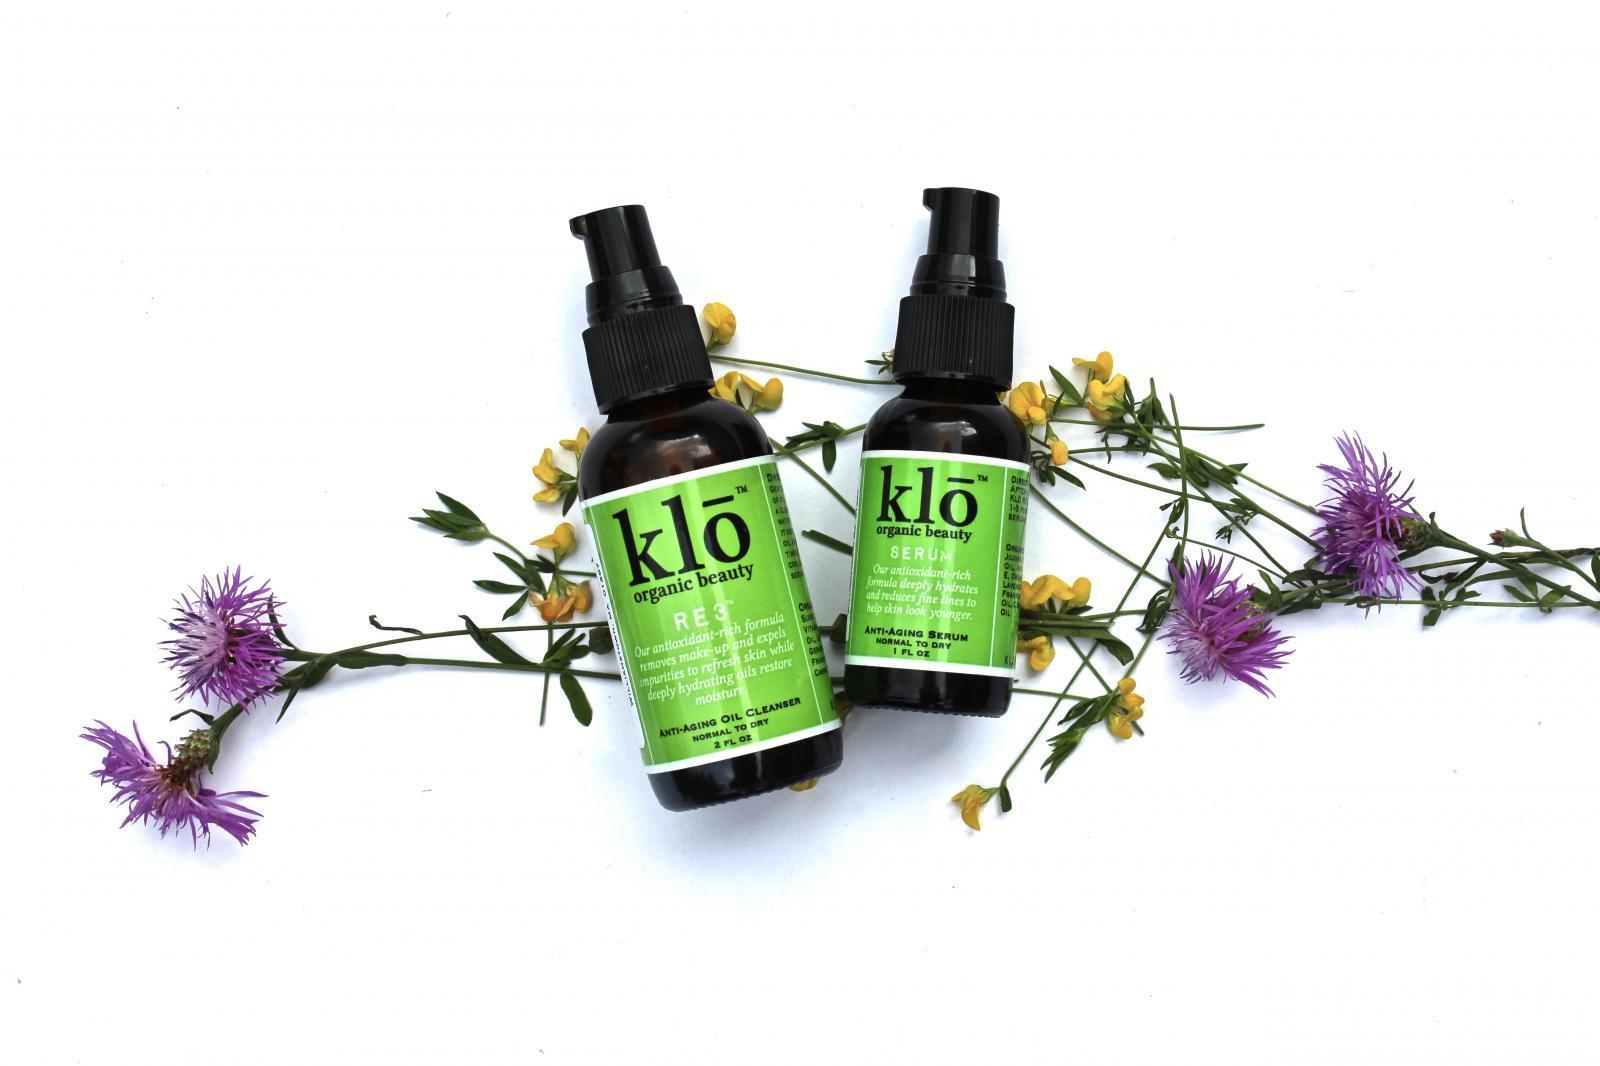 RE3 Oil Cleanser + Serum Duo (normal-dry skin)